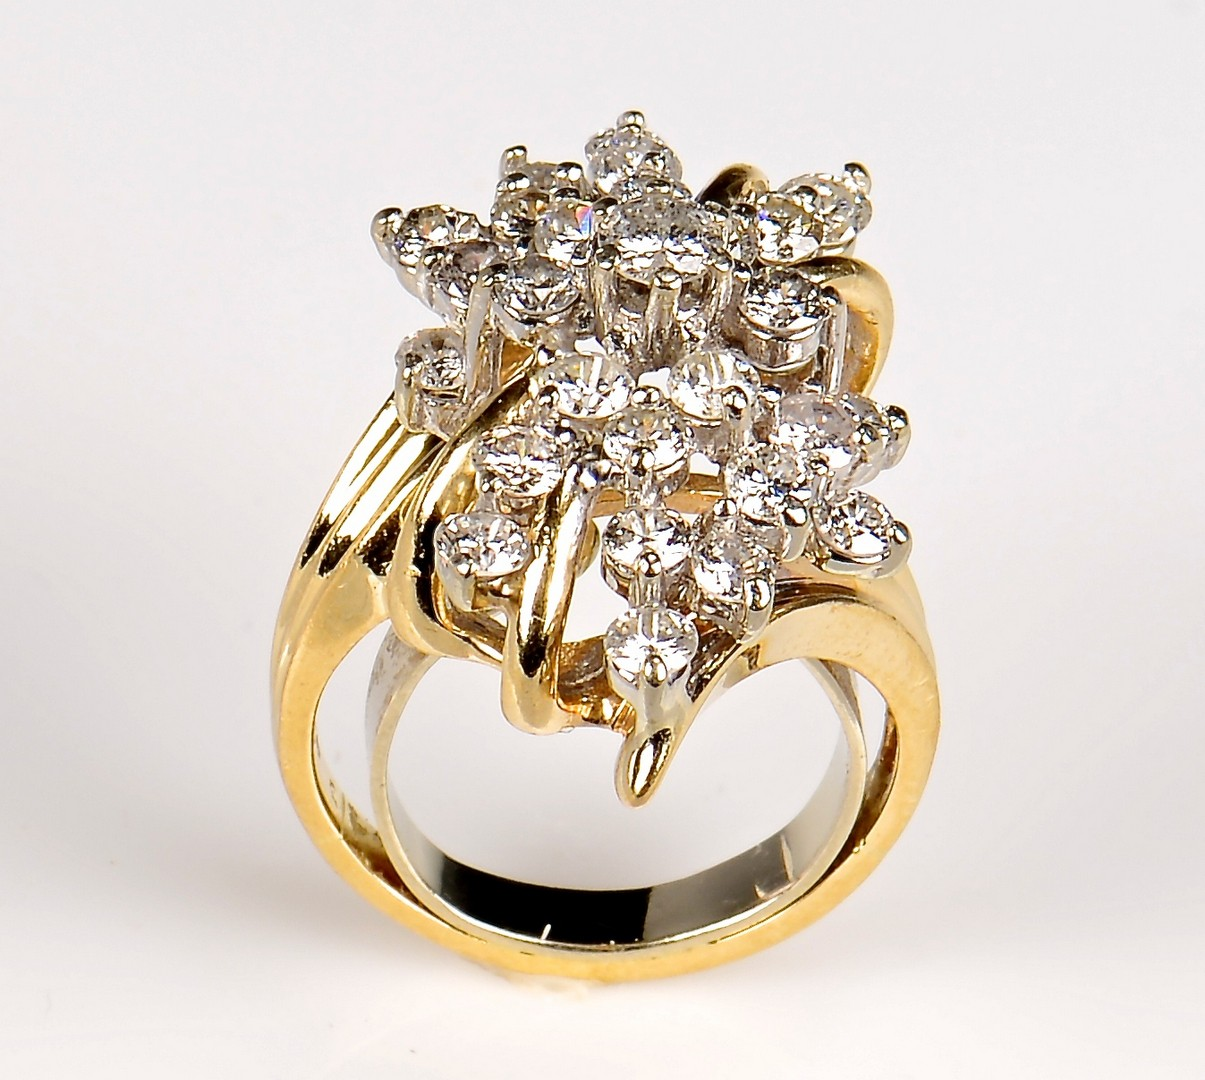 Lot 369 10k Diamond Waterfall Cluster Ring